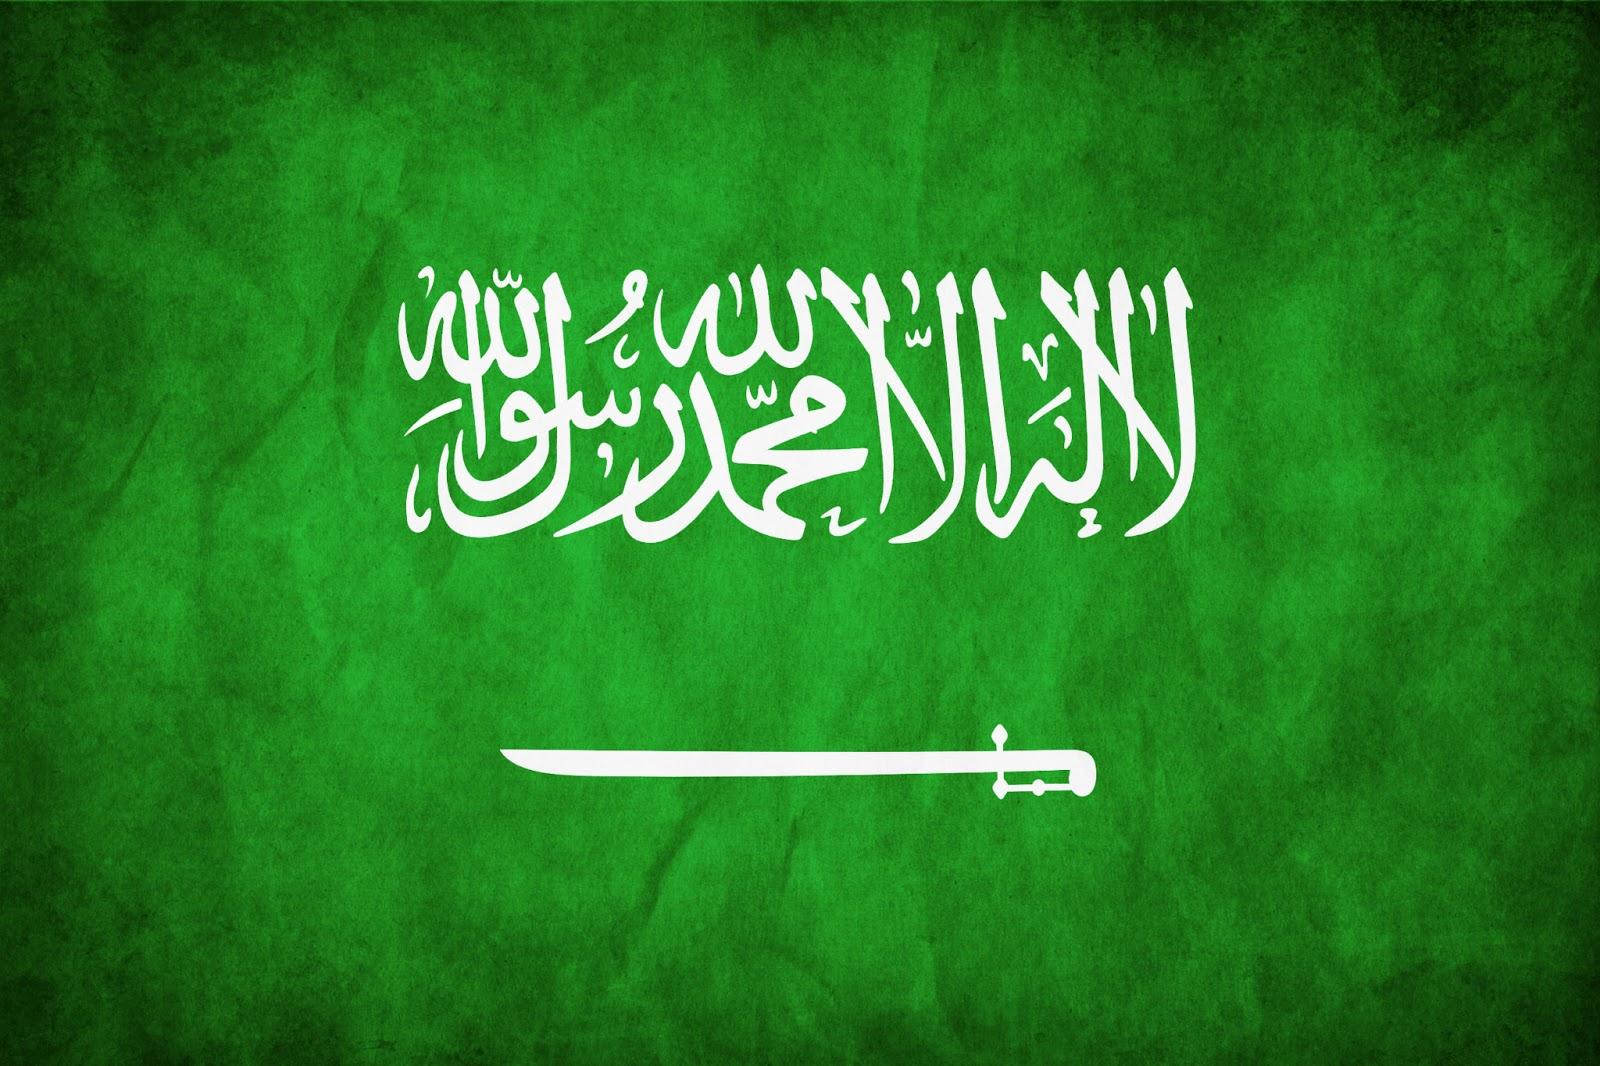 Wallpapers Ors Wallpapers Islamic Wallpapers HD All Islamic 1600x1066